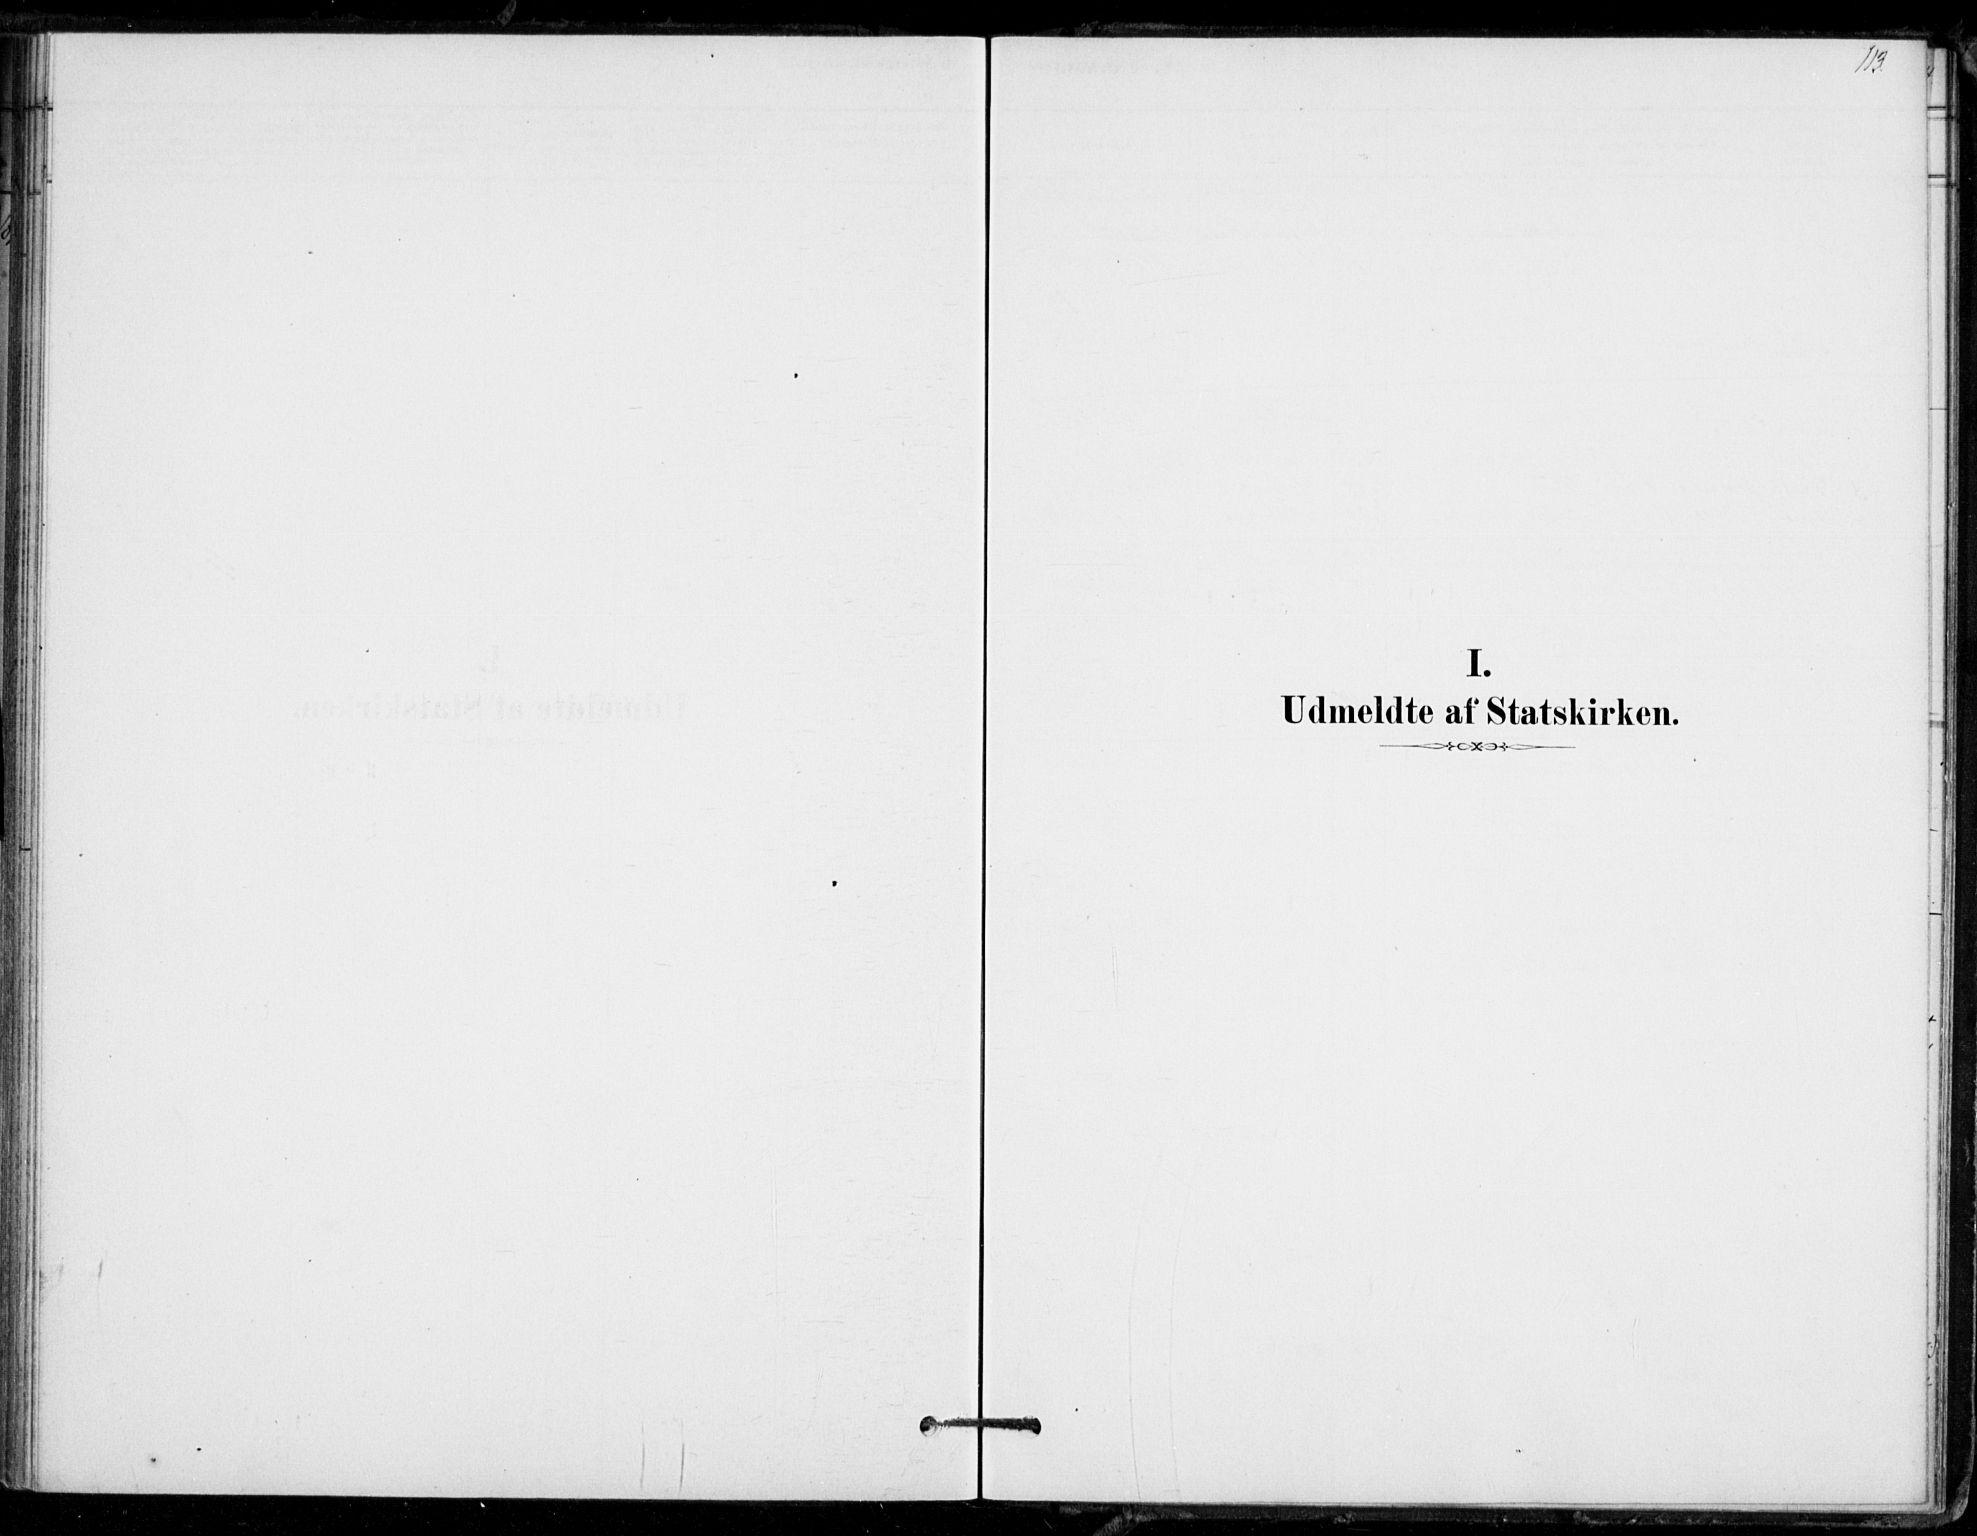 SAKO, Hof kirkebøker, F/Fb/L0001: Ministerialbok nr. II 1, 1878-1907, s. 113